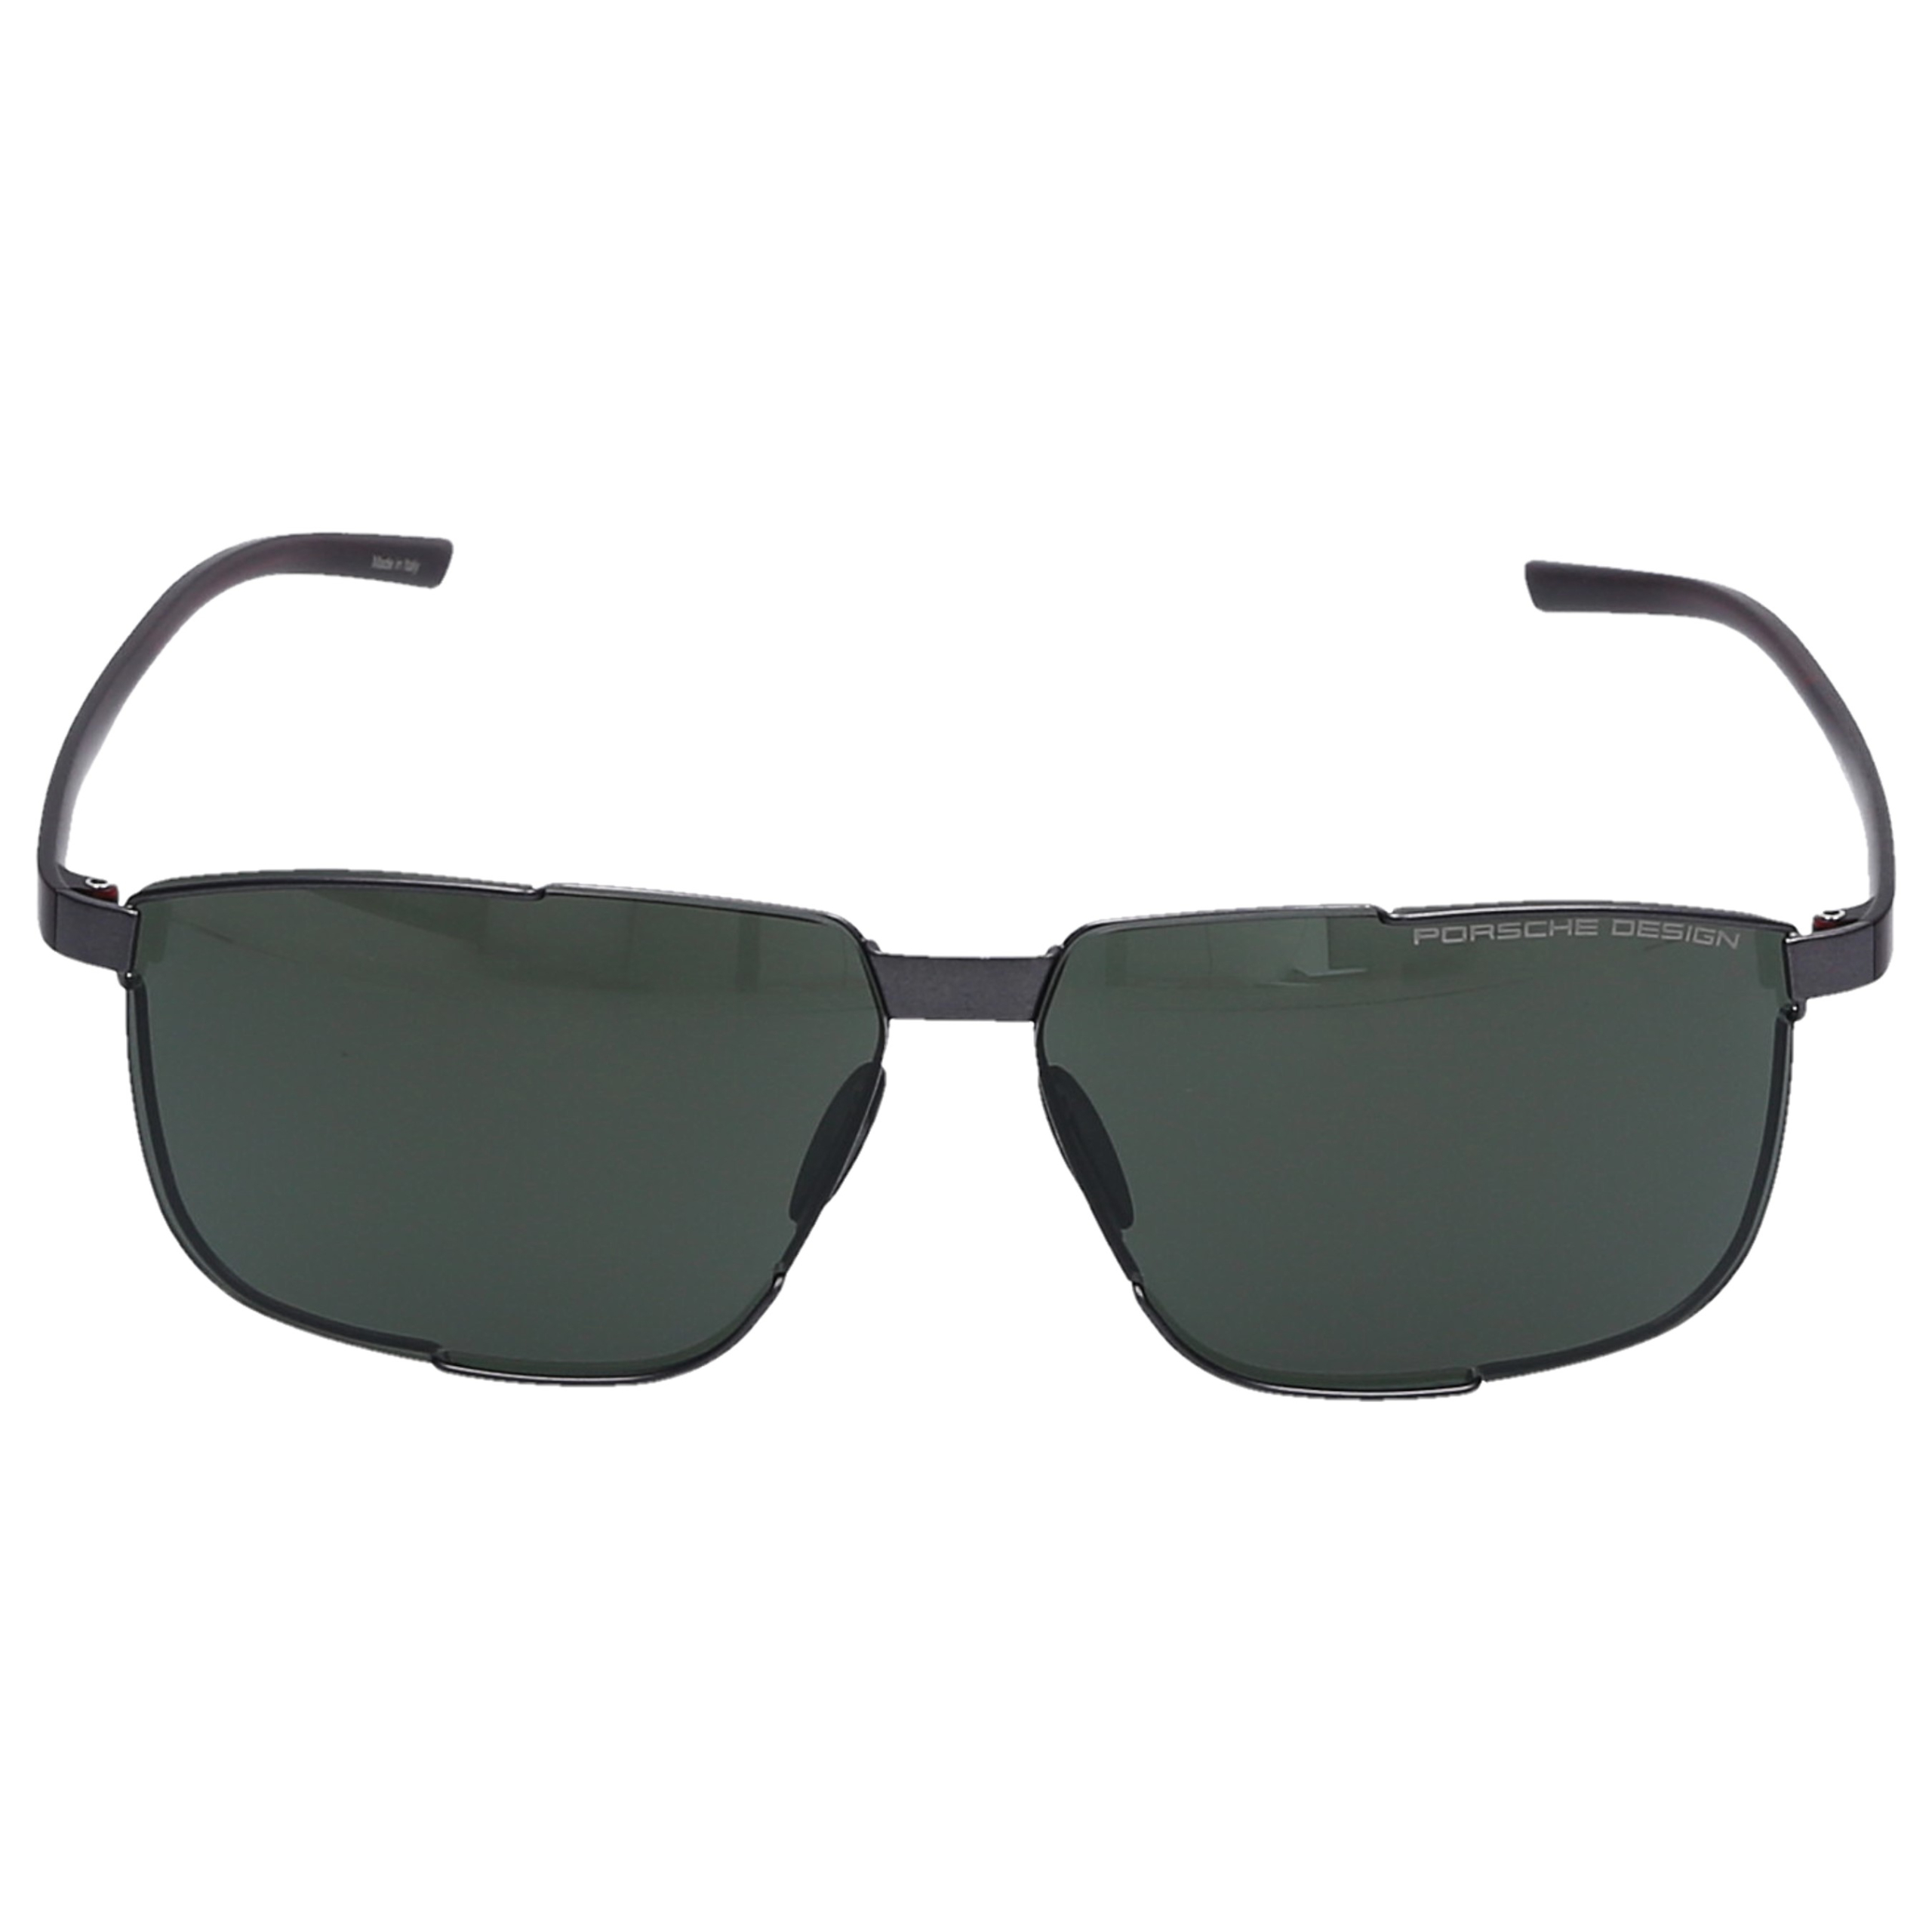 Sonnenbrille D-Frame P8680 C 64/12 Acetat rot